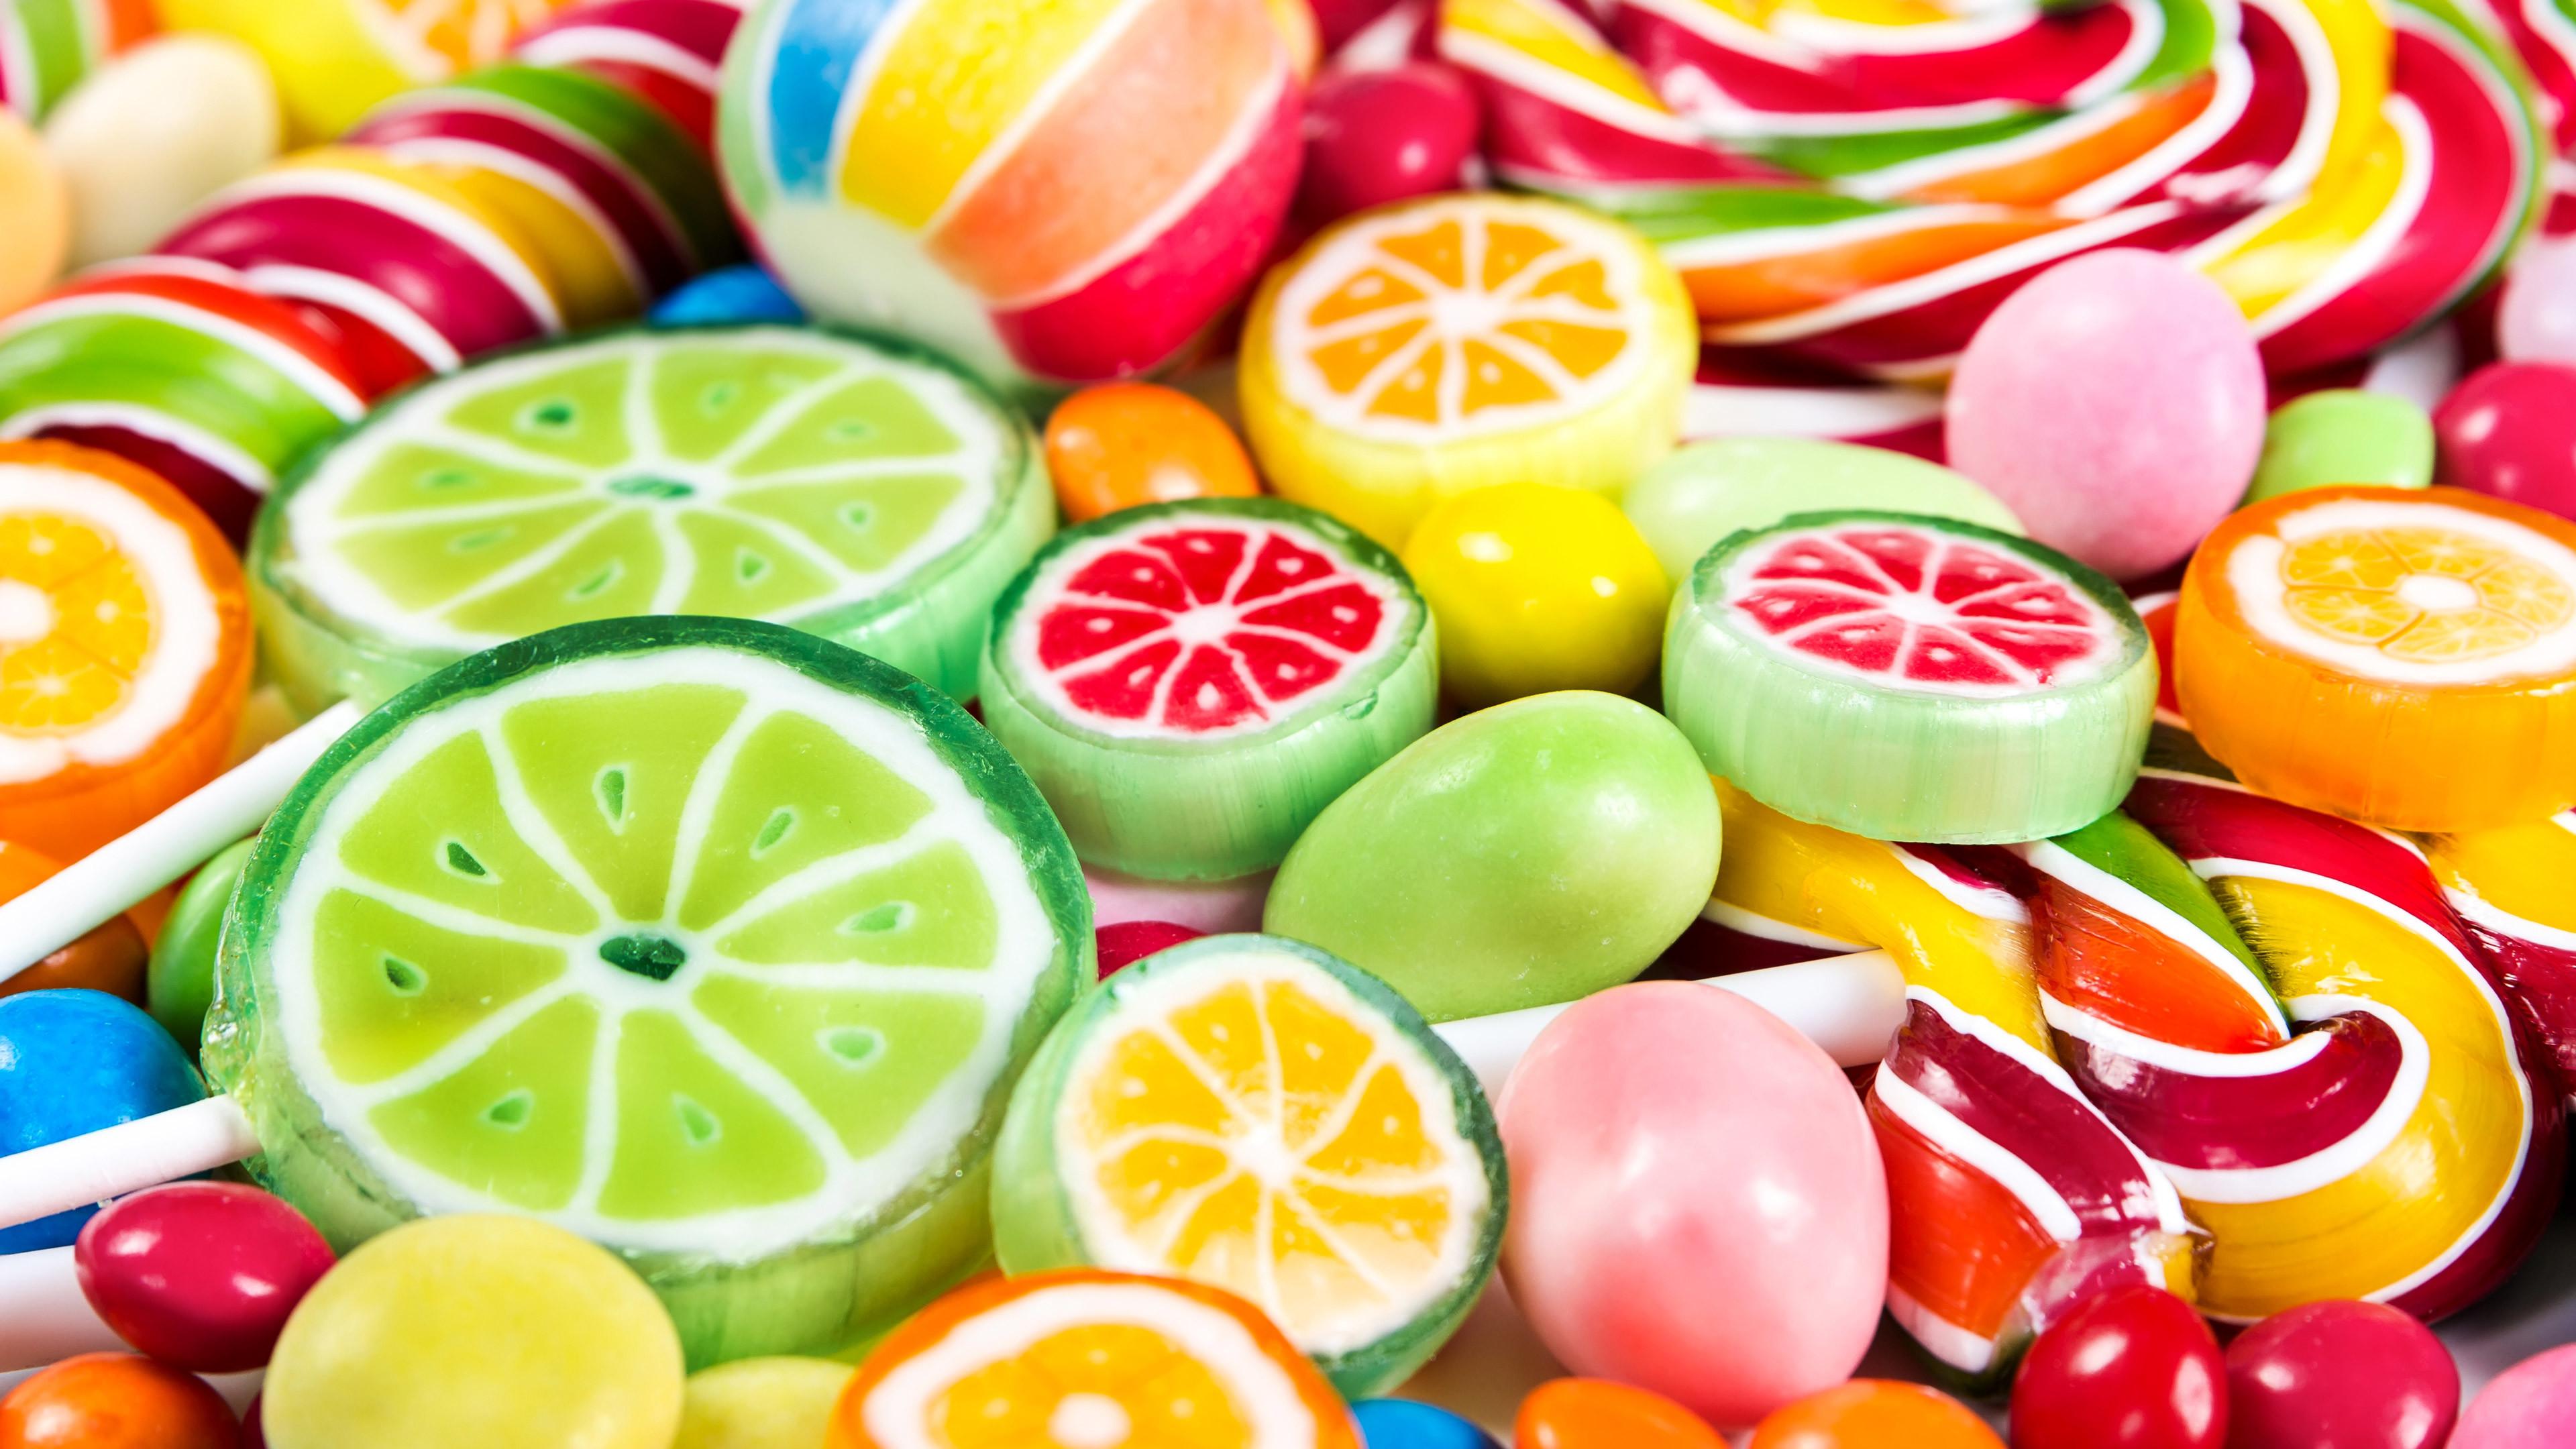 57 Kawaii Candy Wallpapers on WallpaperPlay 3840x2160